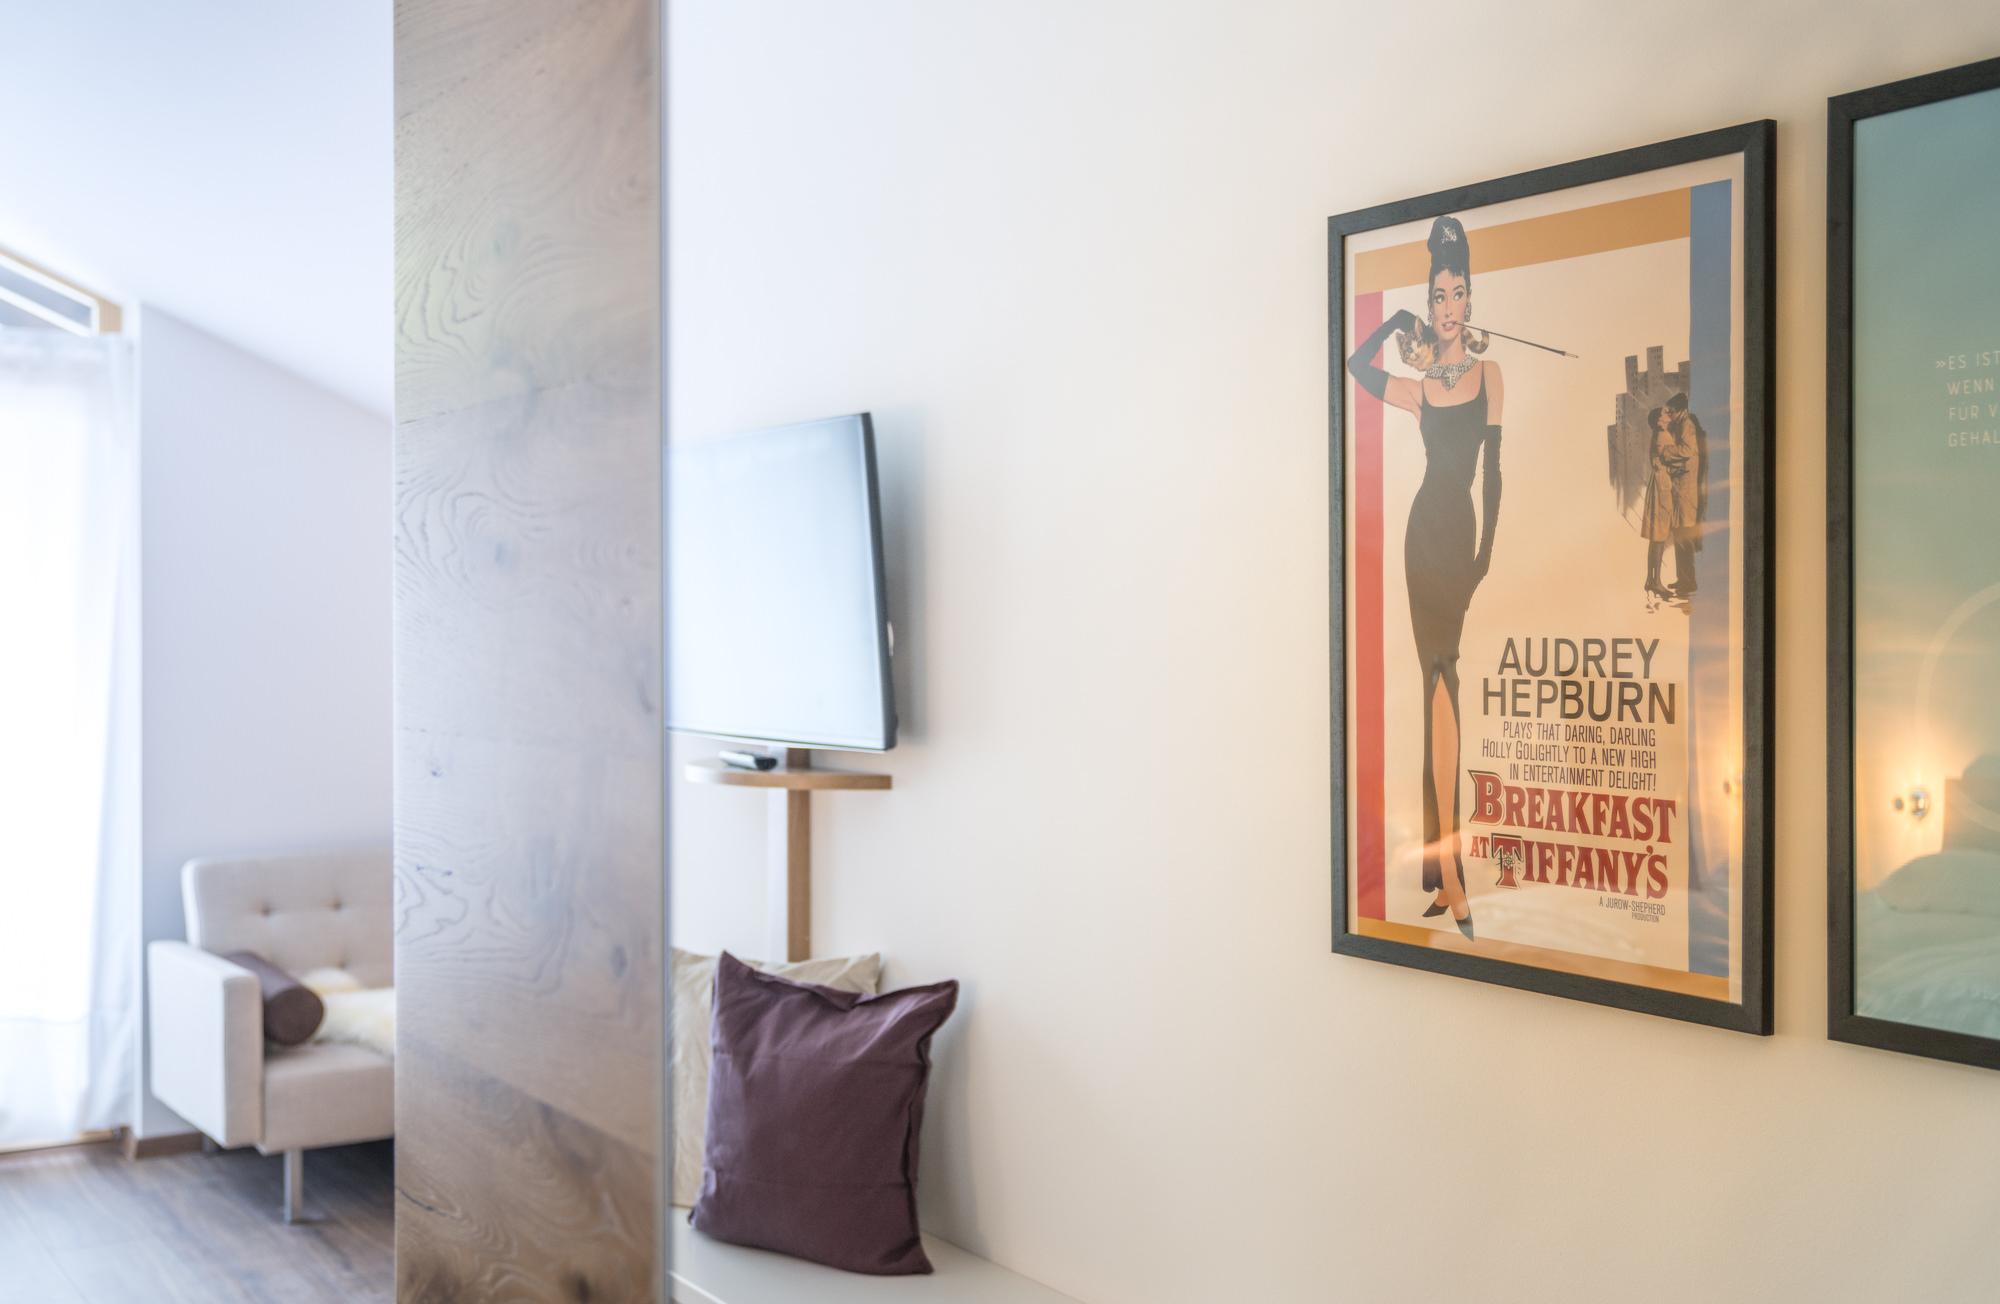 Hotelfotografie-Detlev-Christian Schmidt-fuer-STEFANIES-Bad-Feilnbach